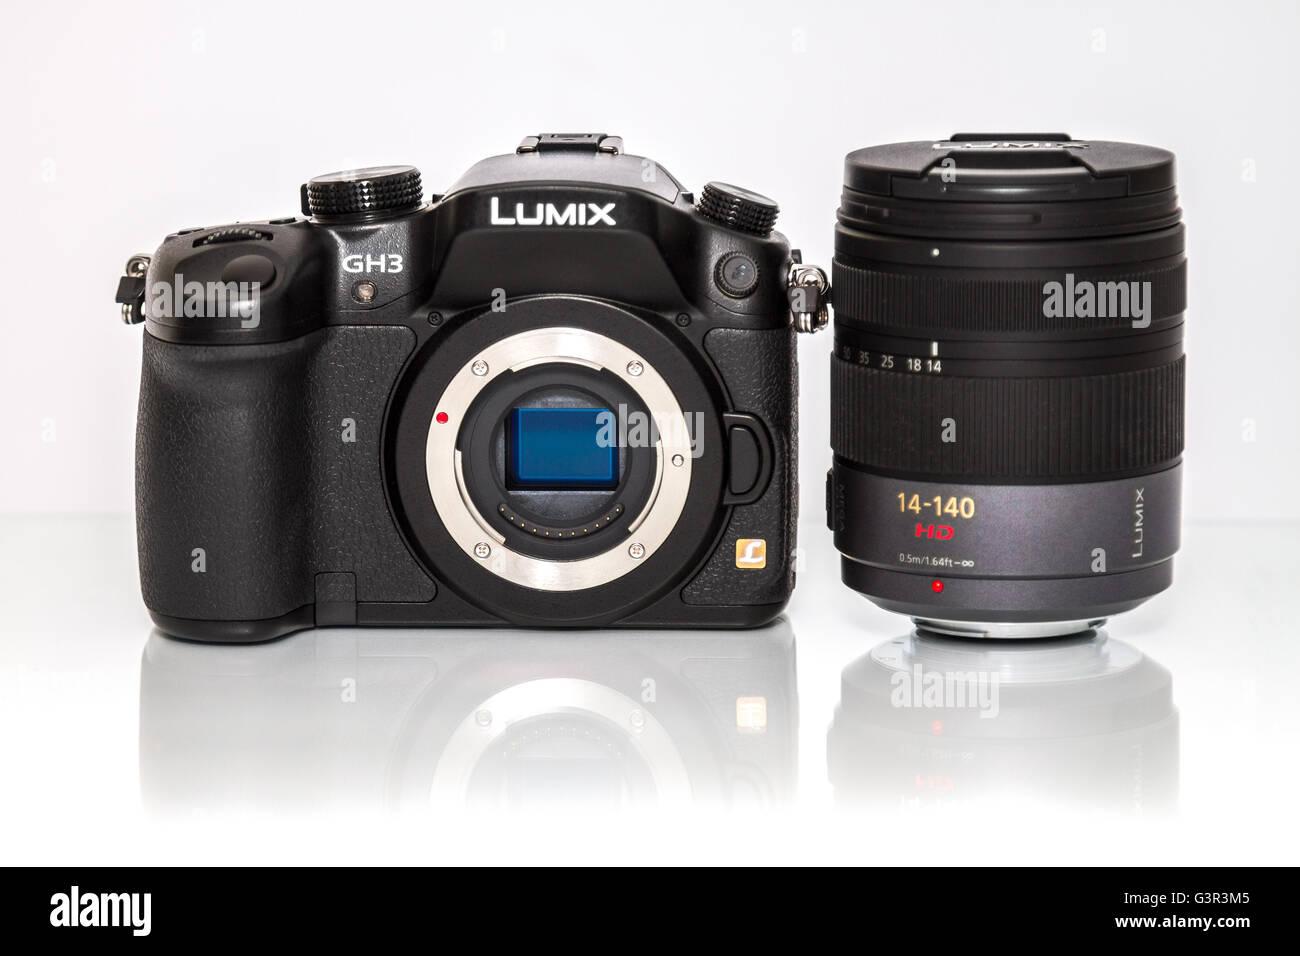 Stock Photo - PANASONIC LUMIX G mirrorless camera with video HD macro Lens 14-140 - Stock Image